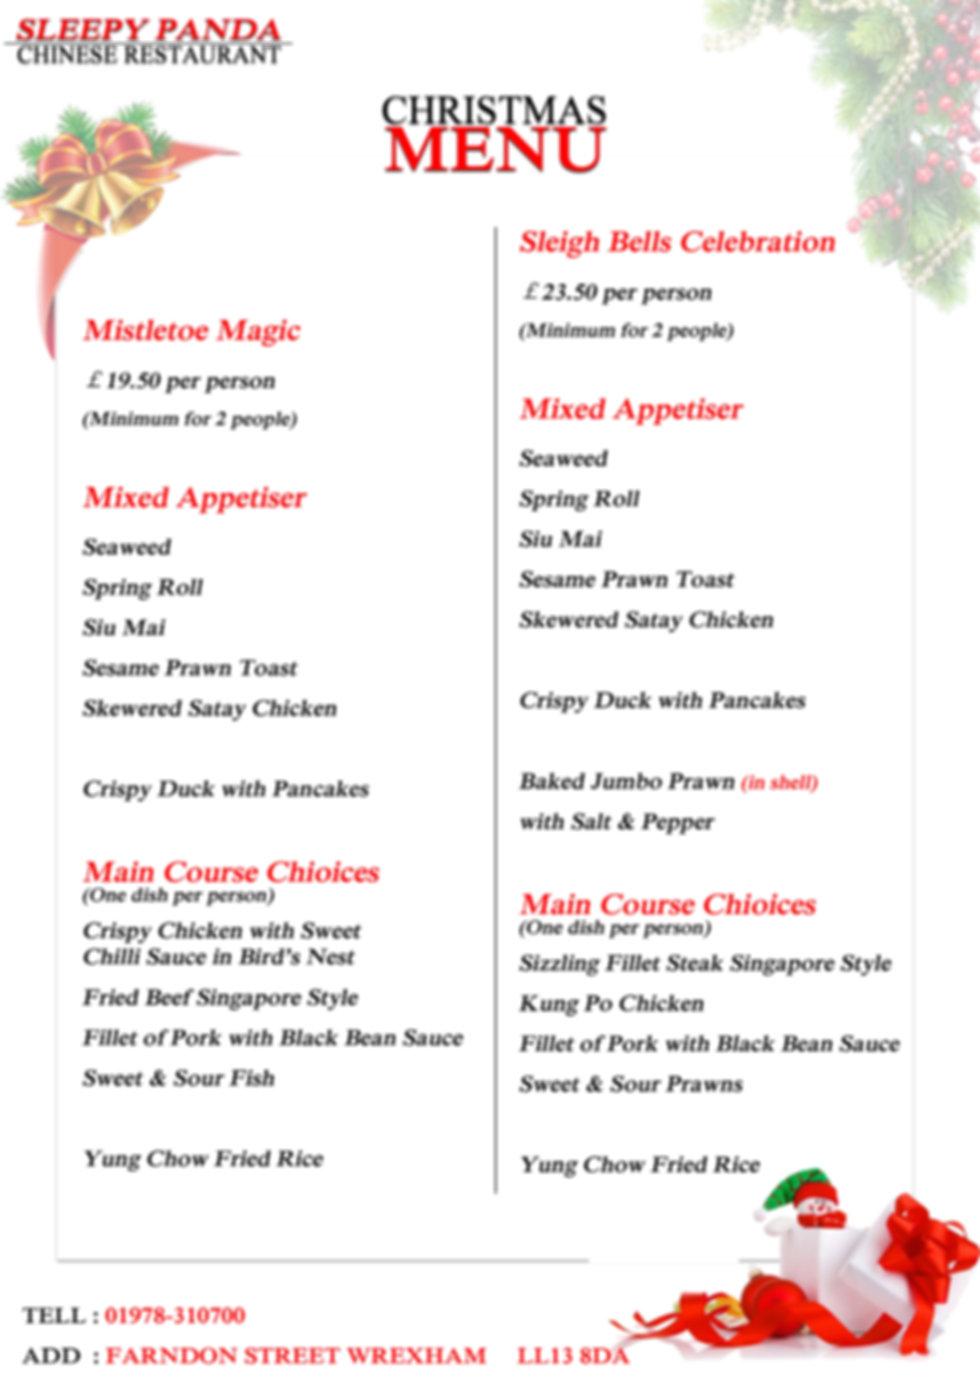 2017 christmas menu.jpg